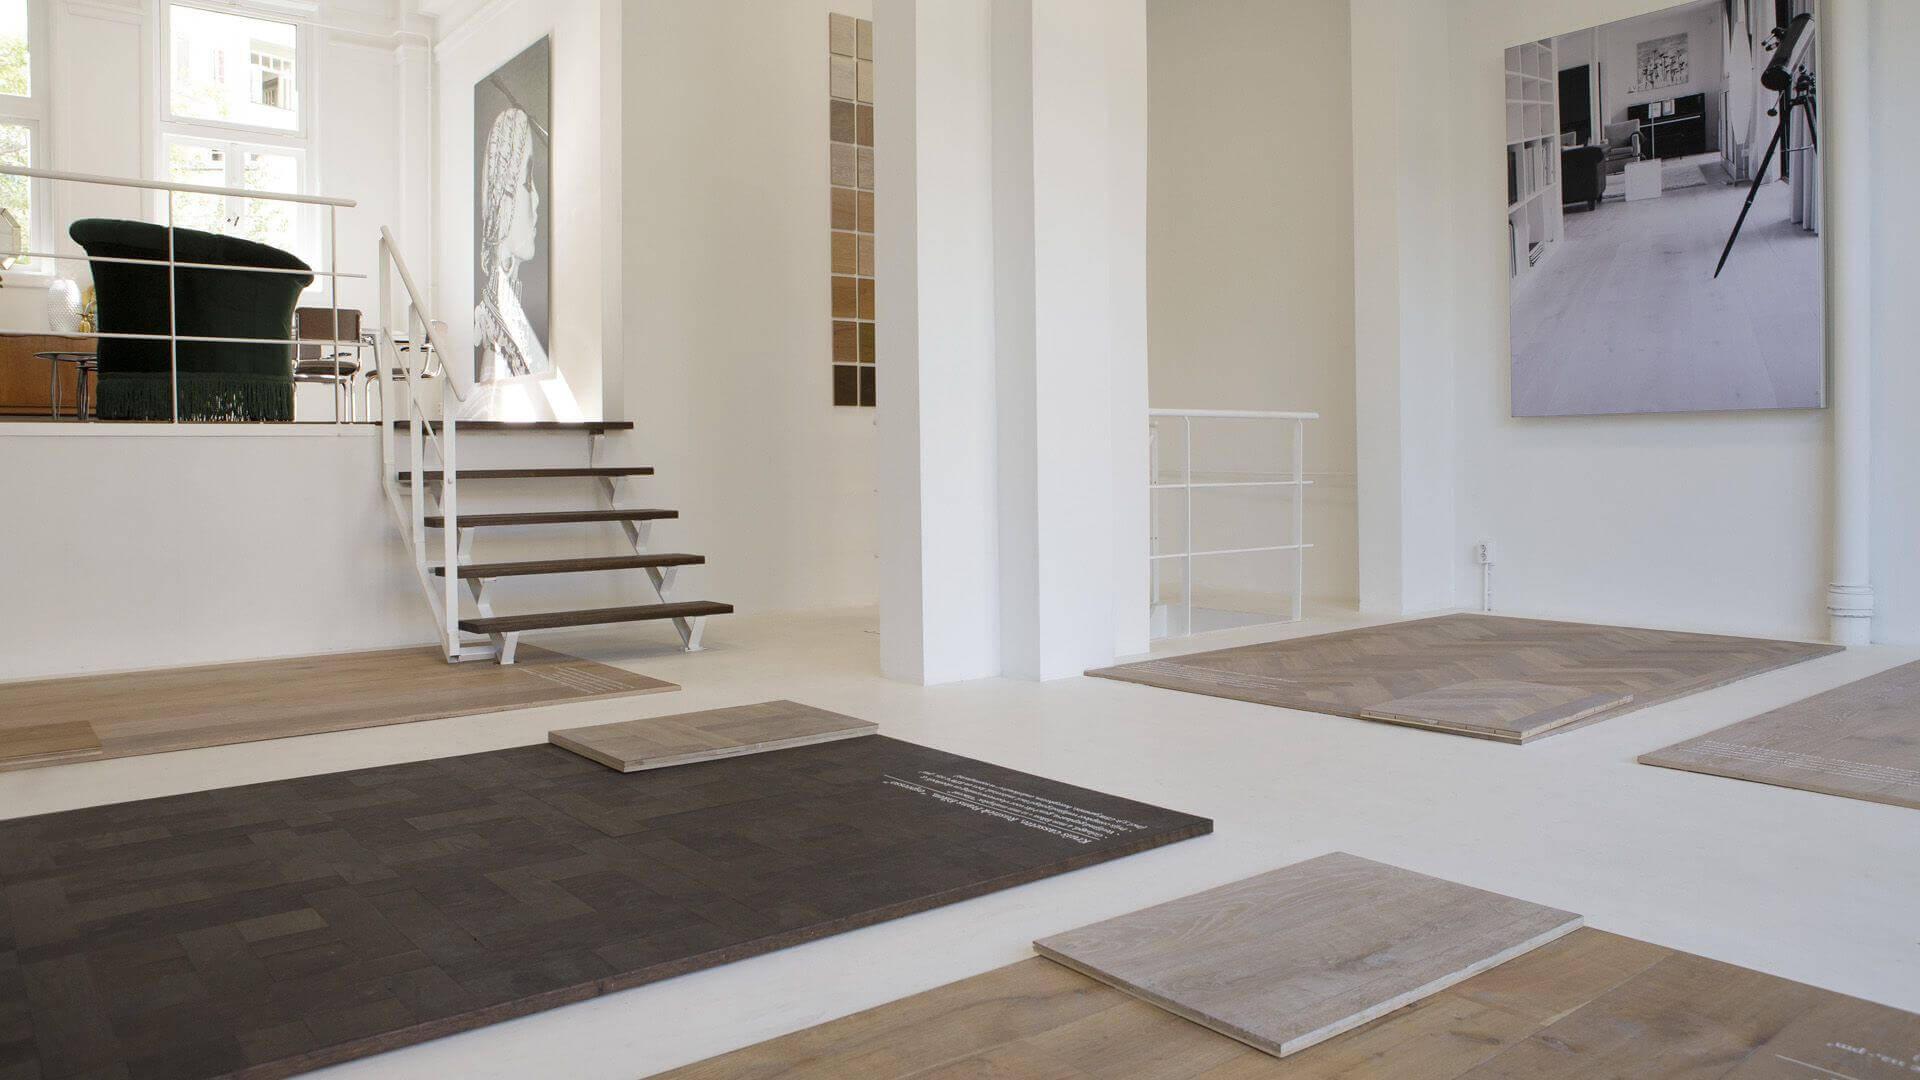 uipkes wood flooring amsterdam showroom